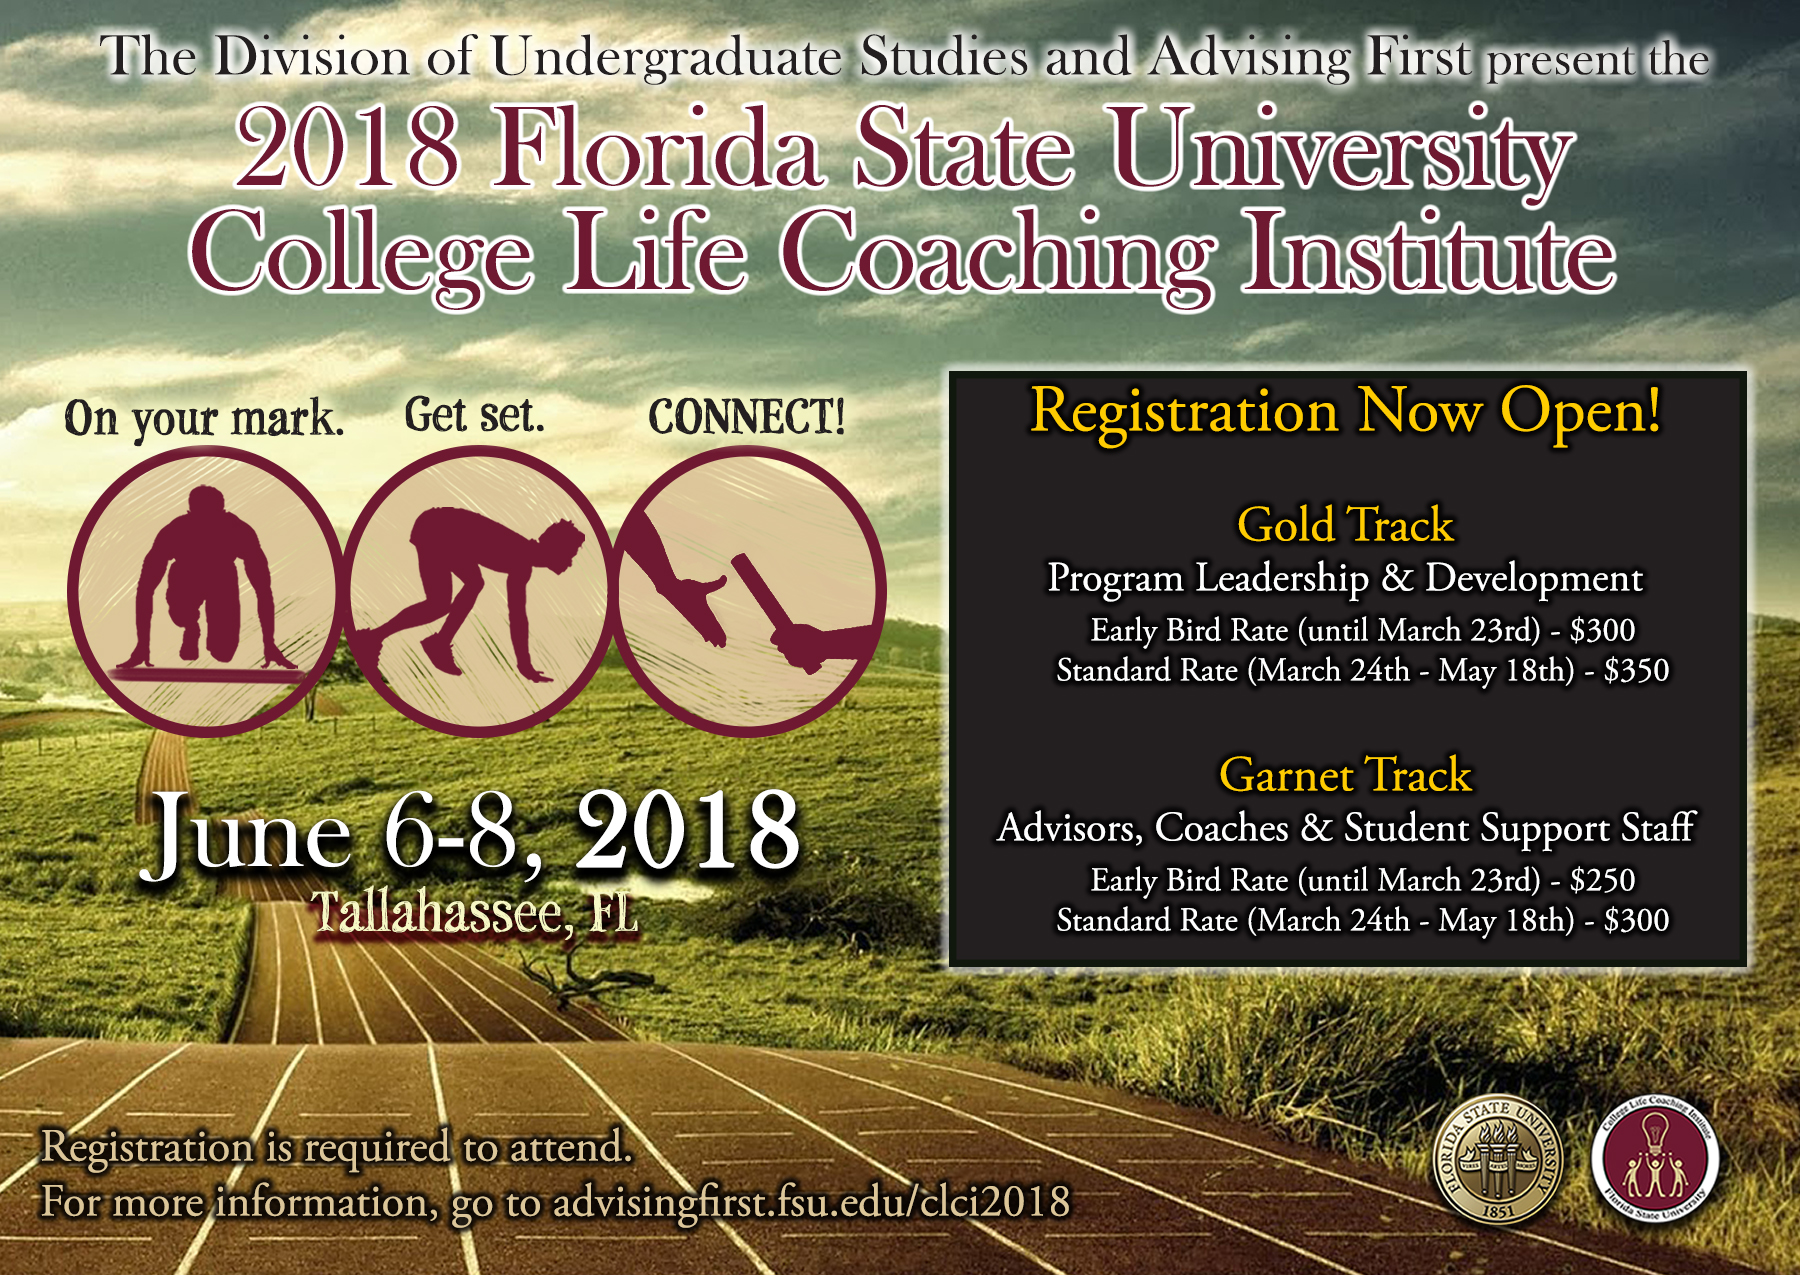 Florida State University College Life Coaching Institute 2018